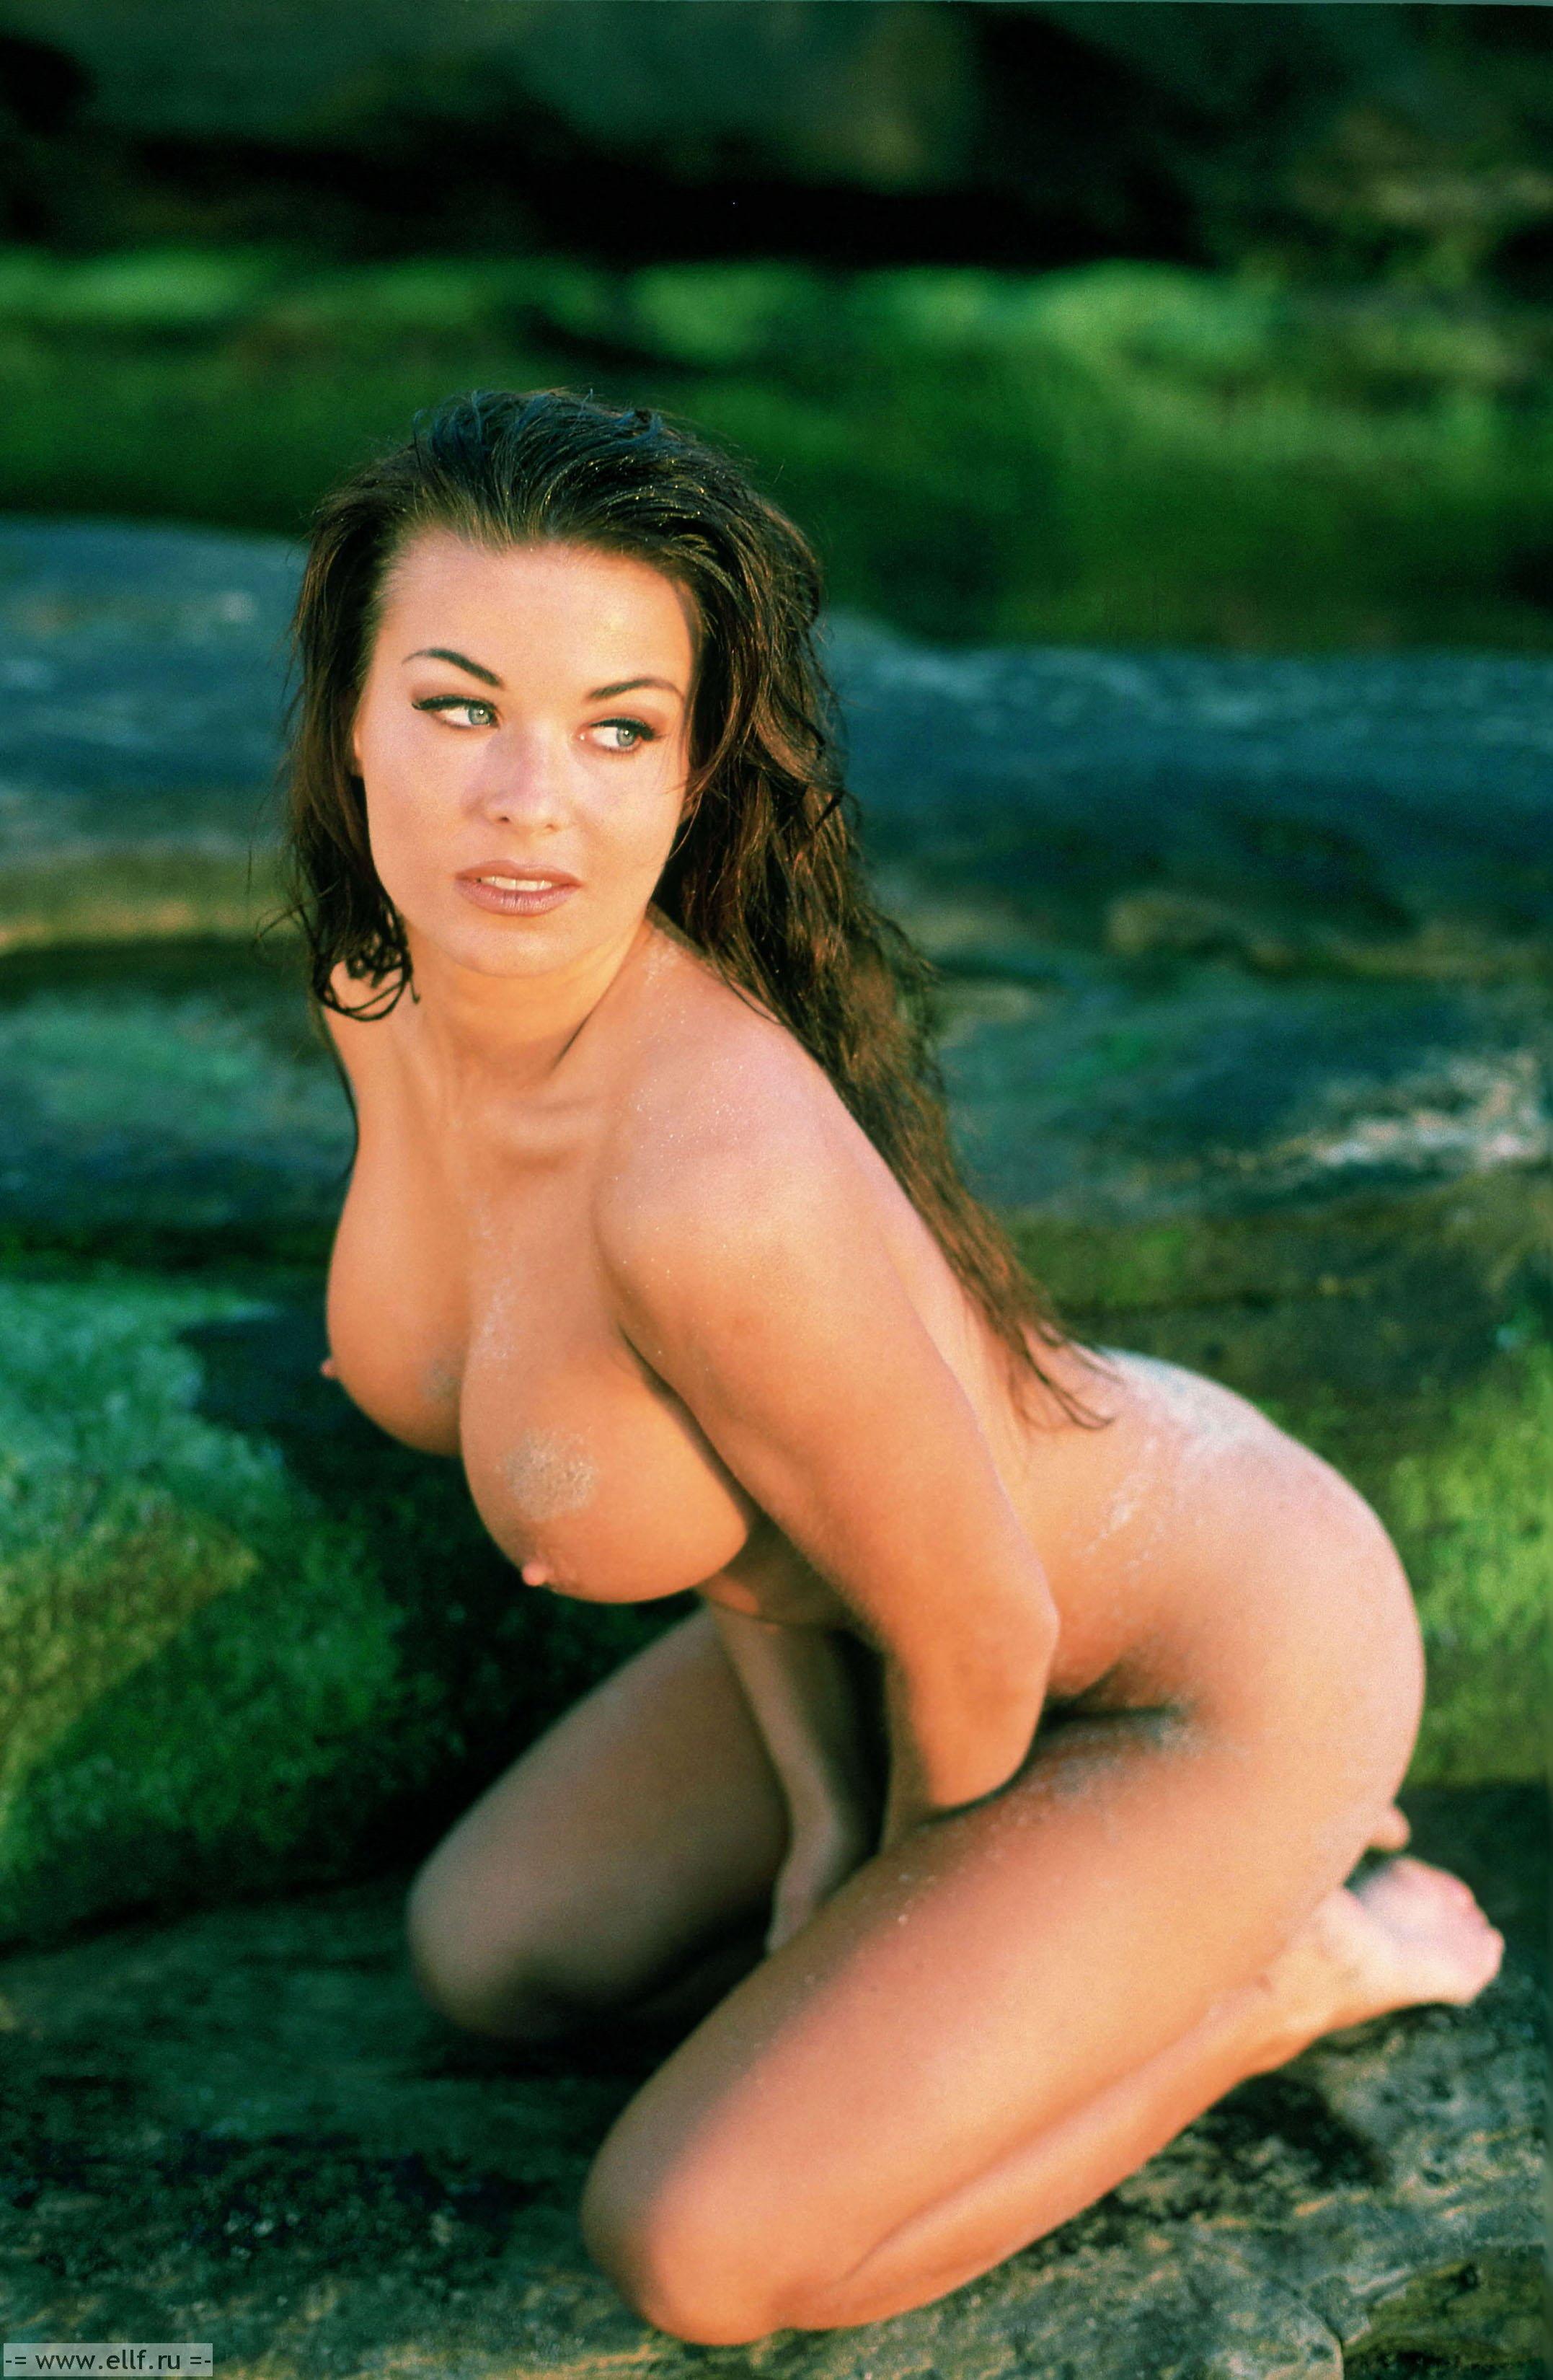 Порно актрисы голливуда фото